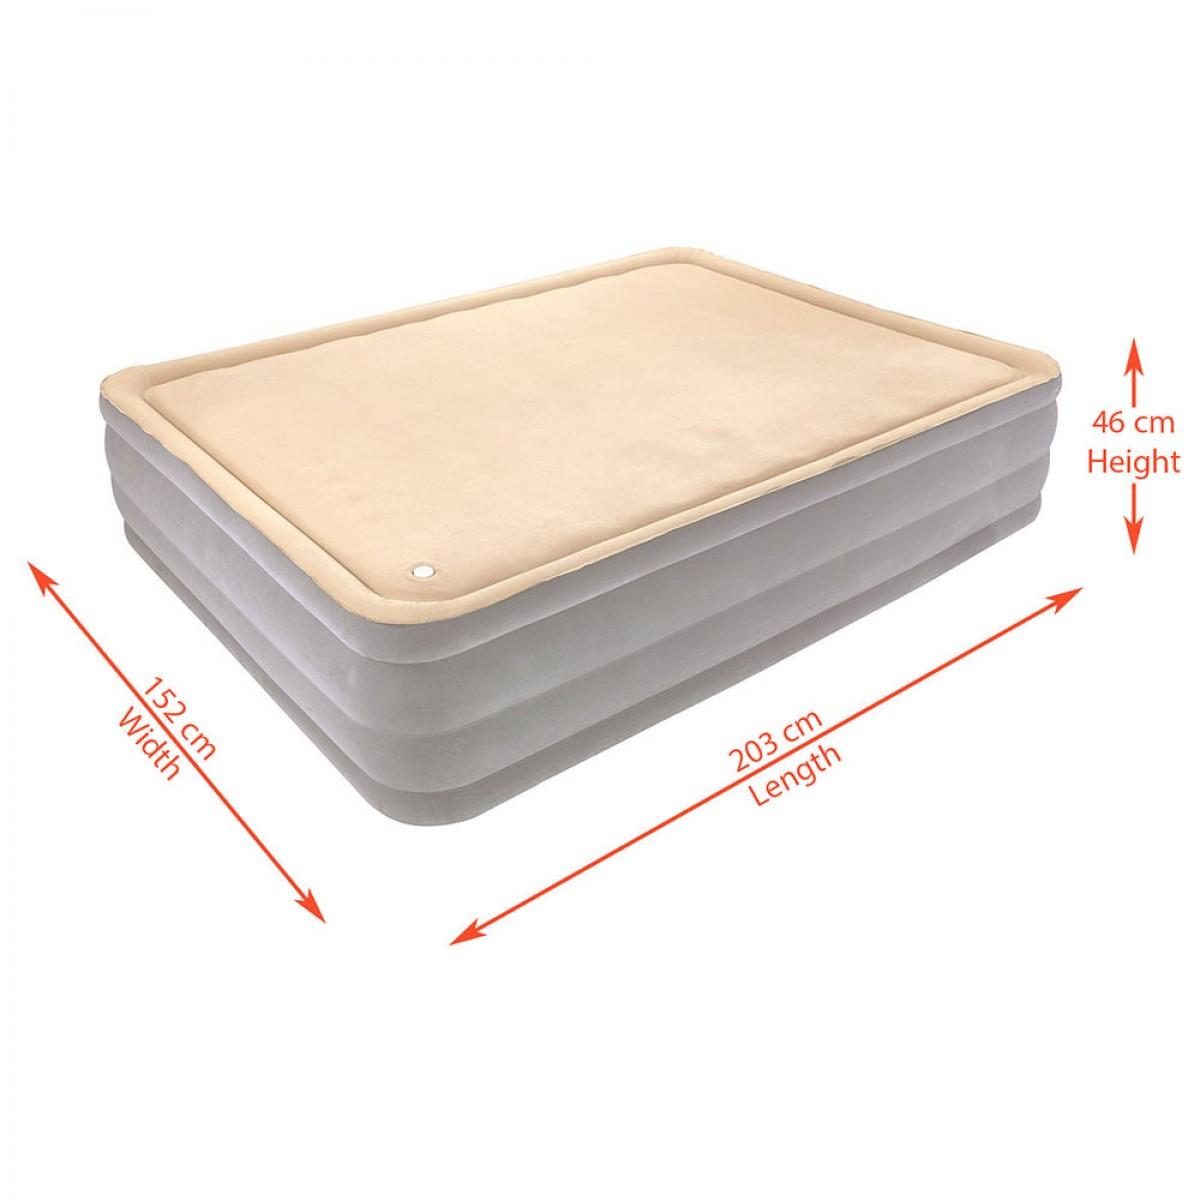 Air mattress sizes decor ideasdecor ideas for Air bed decoration